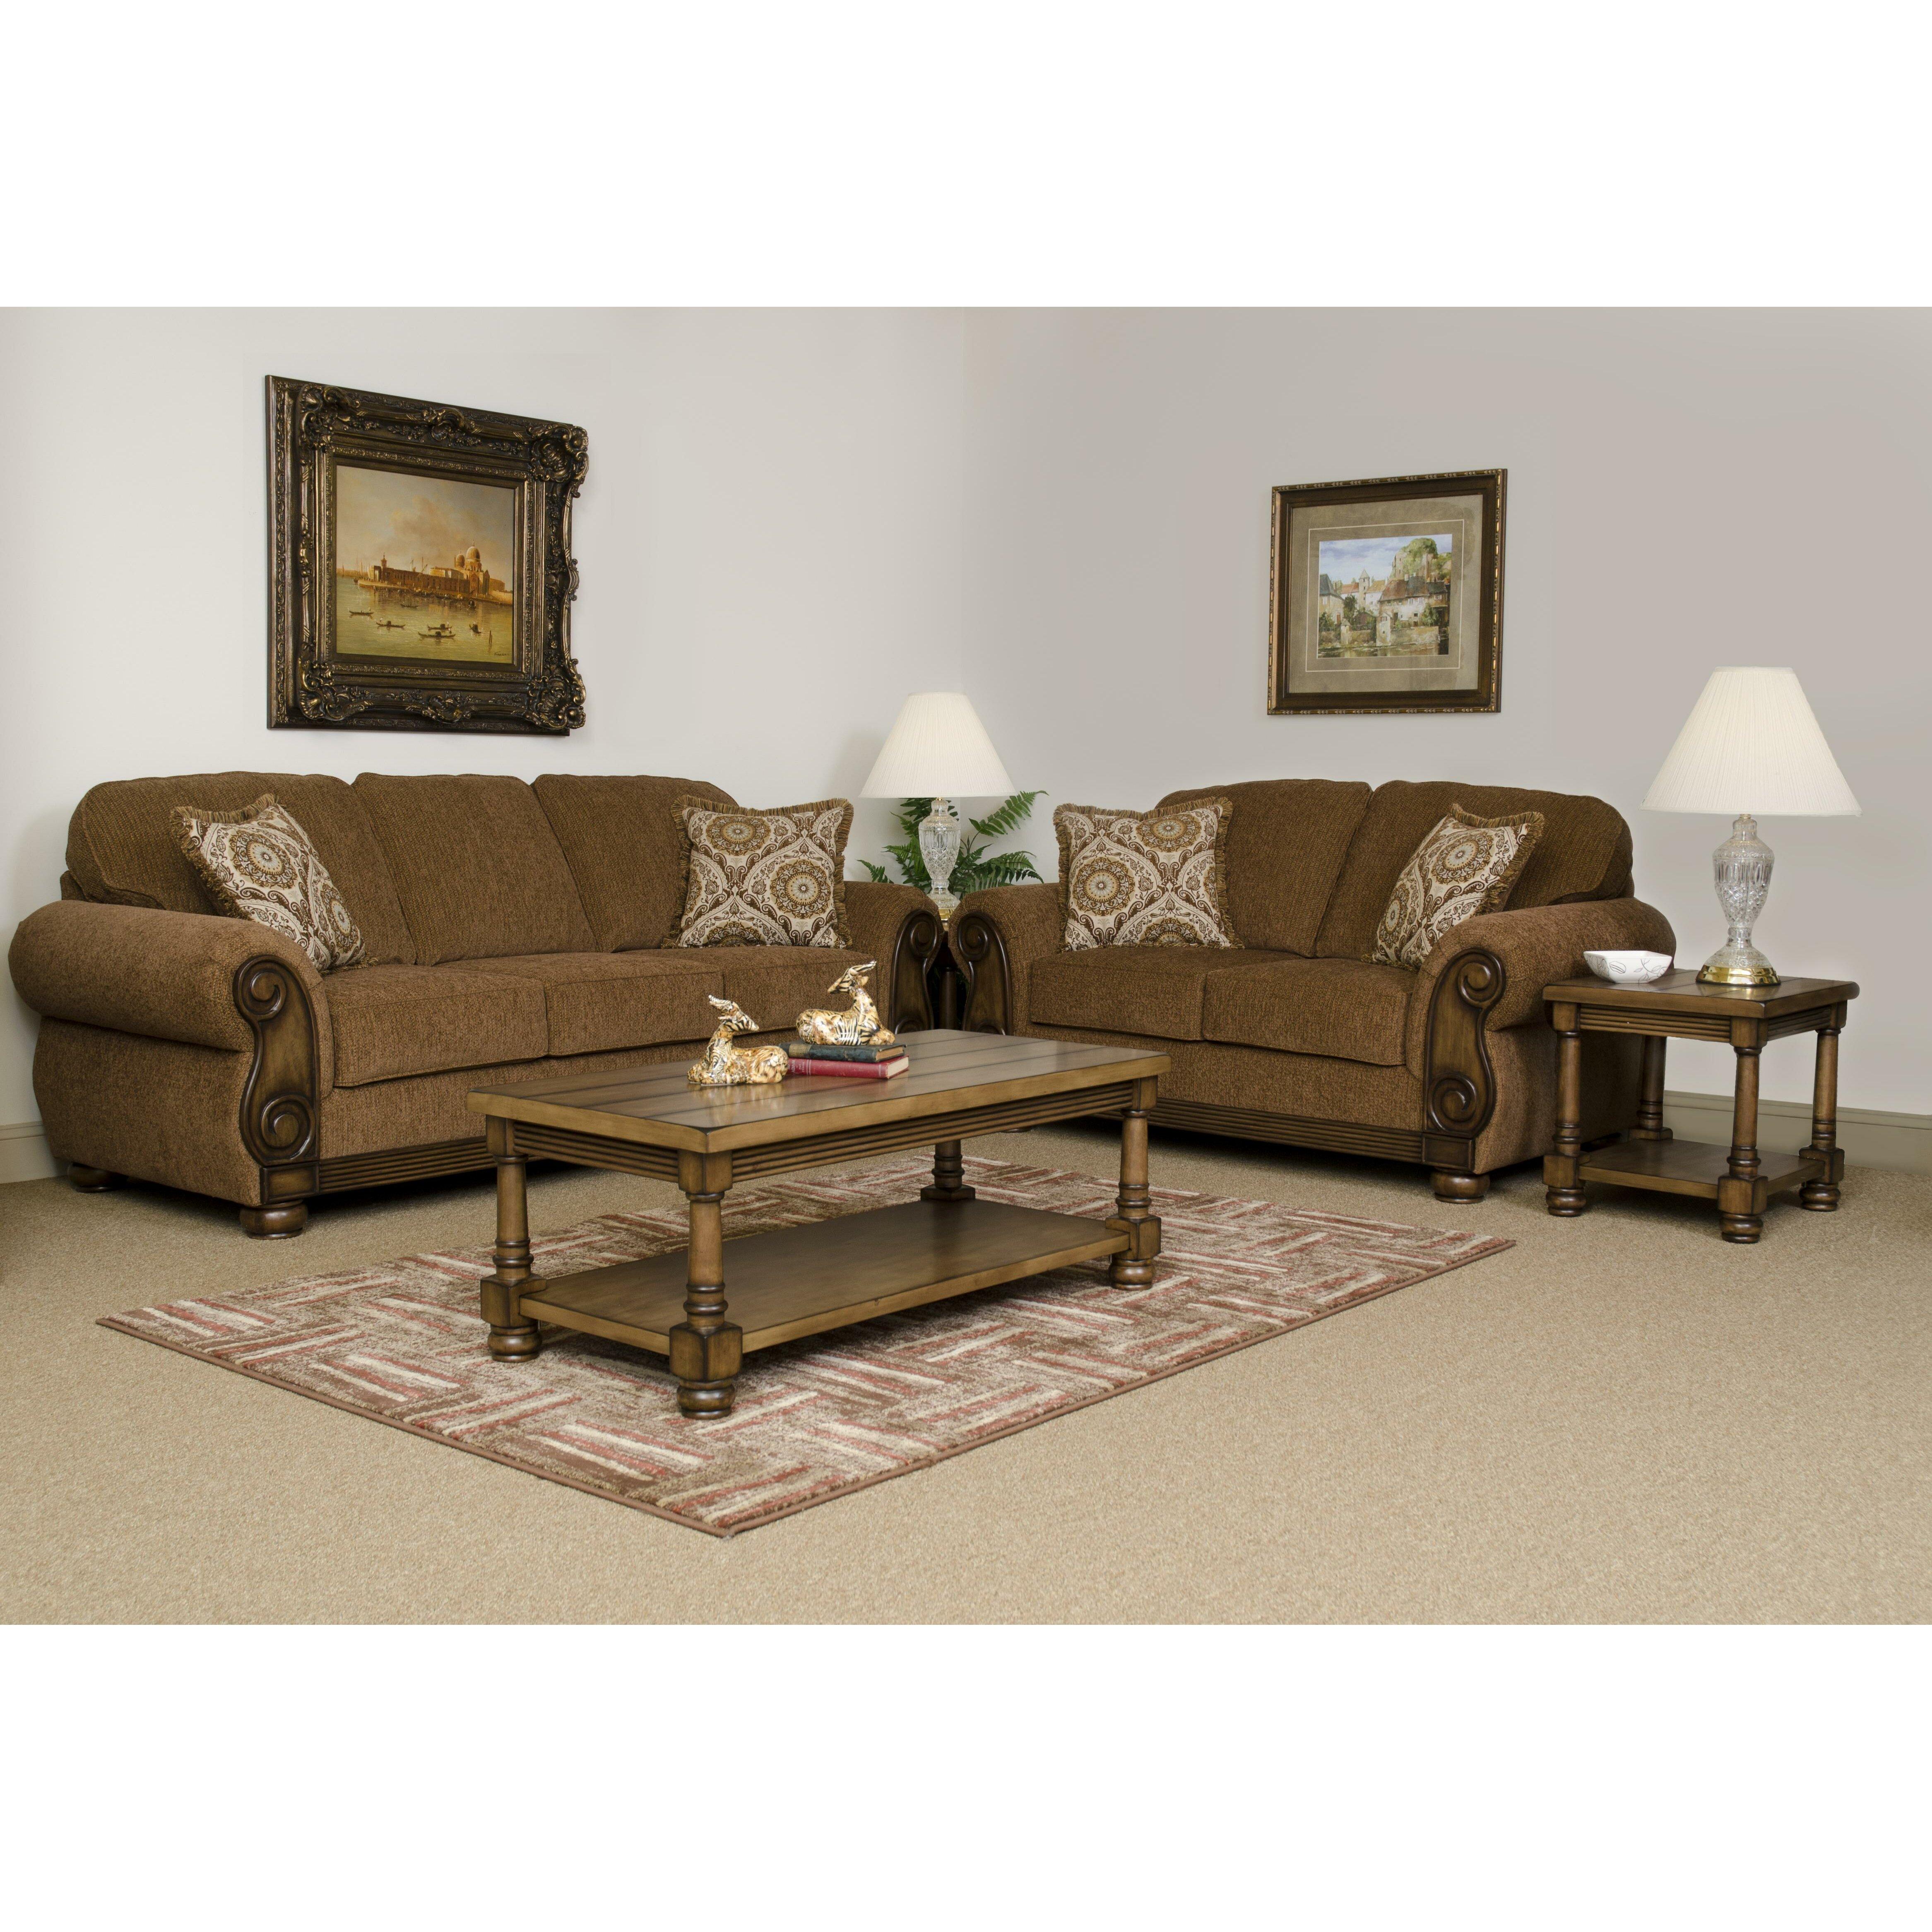 Serta Living Room Furniture Serta Upholstery Sofa Reviews Wayfair